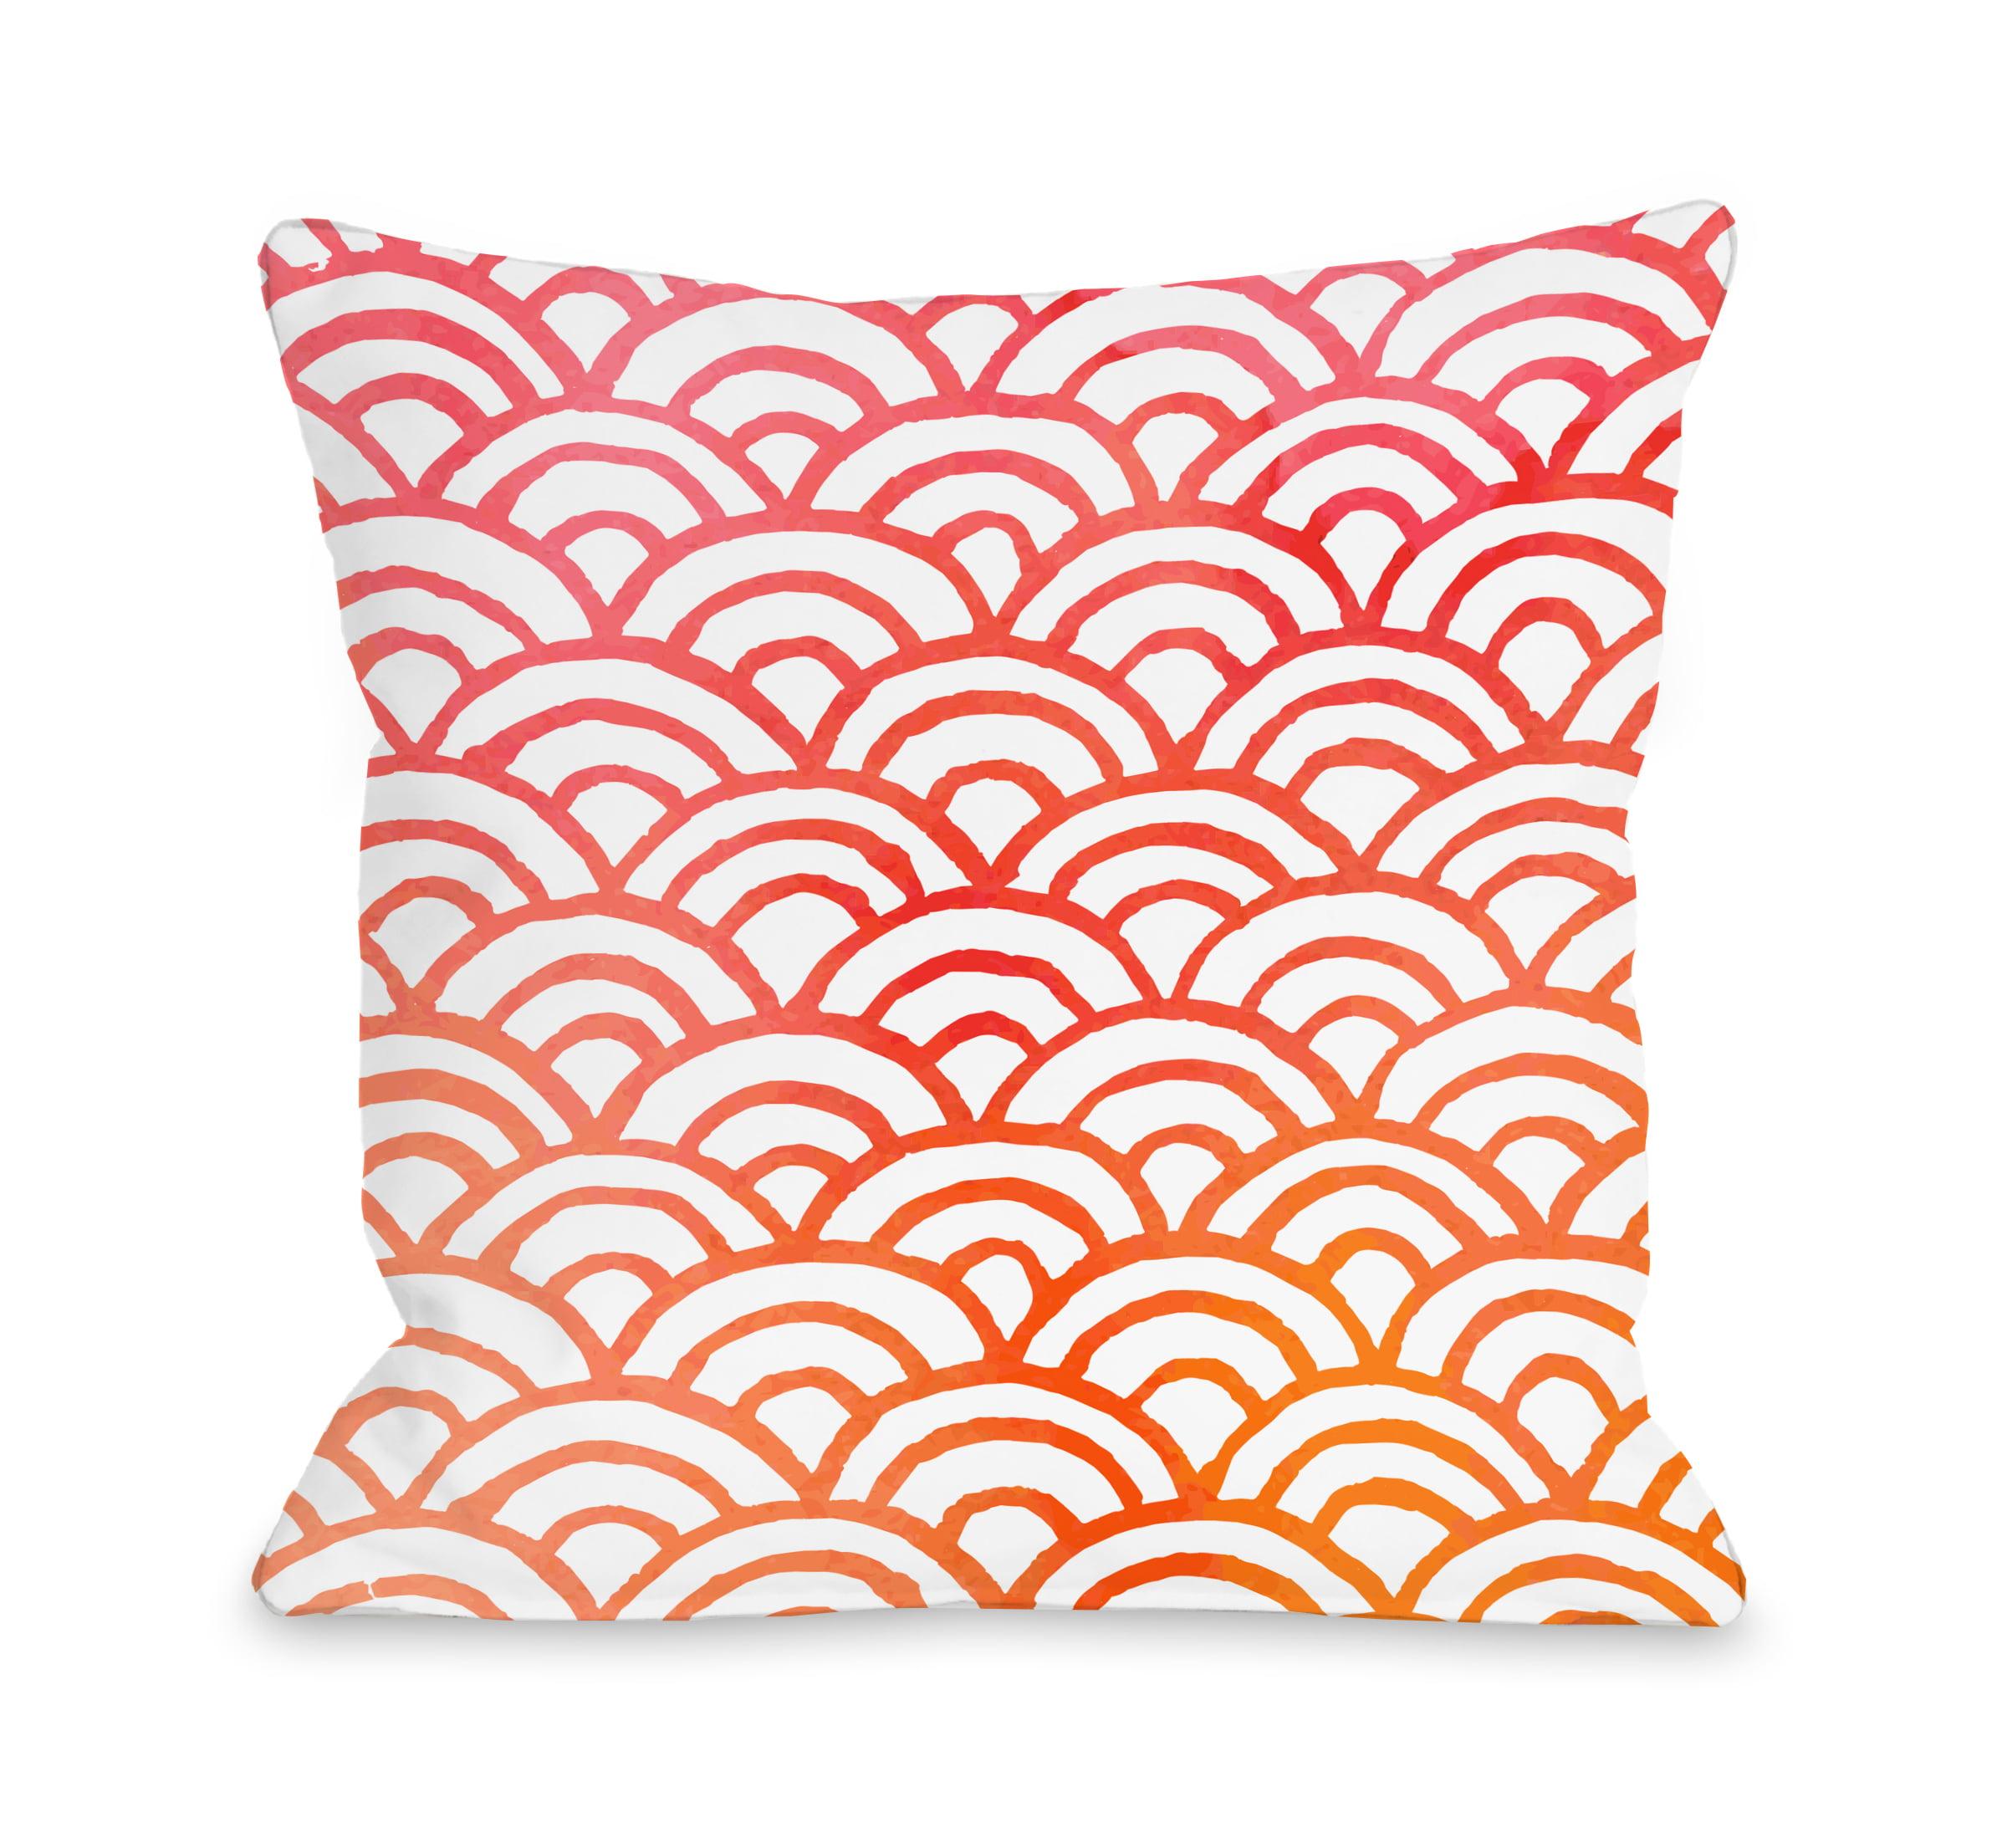 Scallop Melon - Multi 18x18 Pillow by OBC